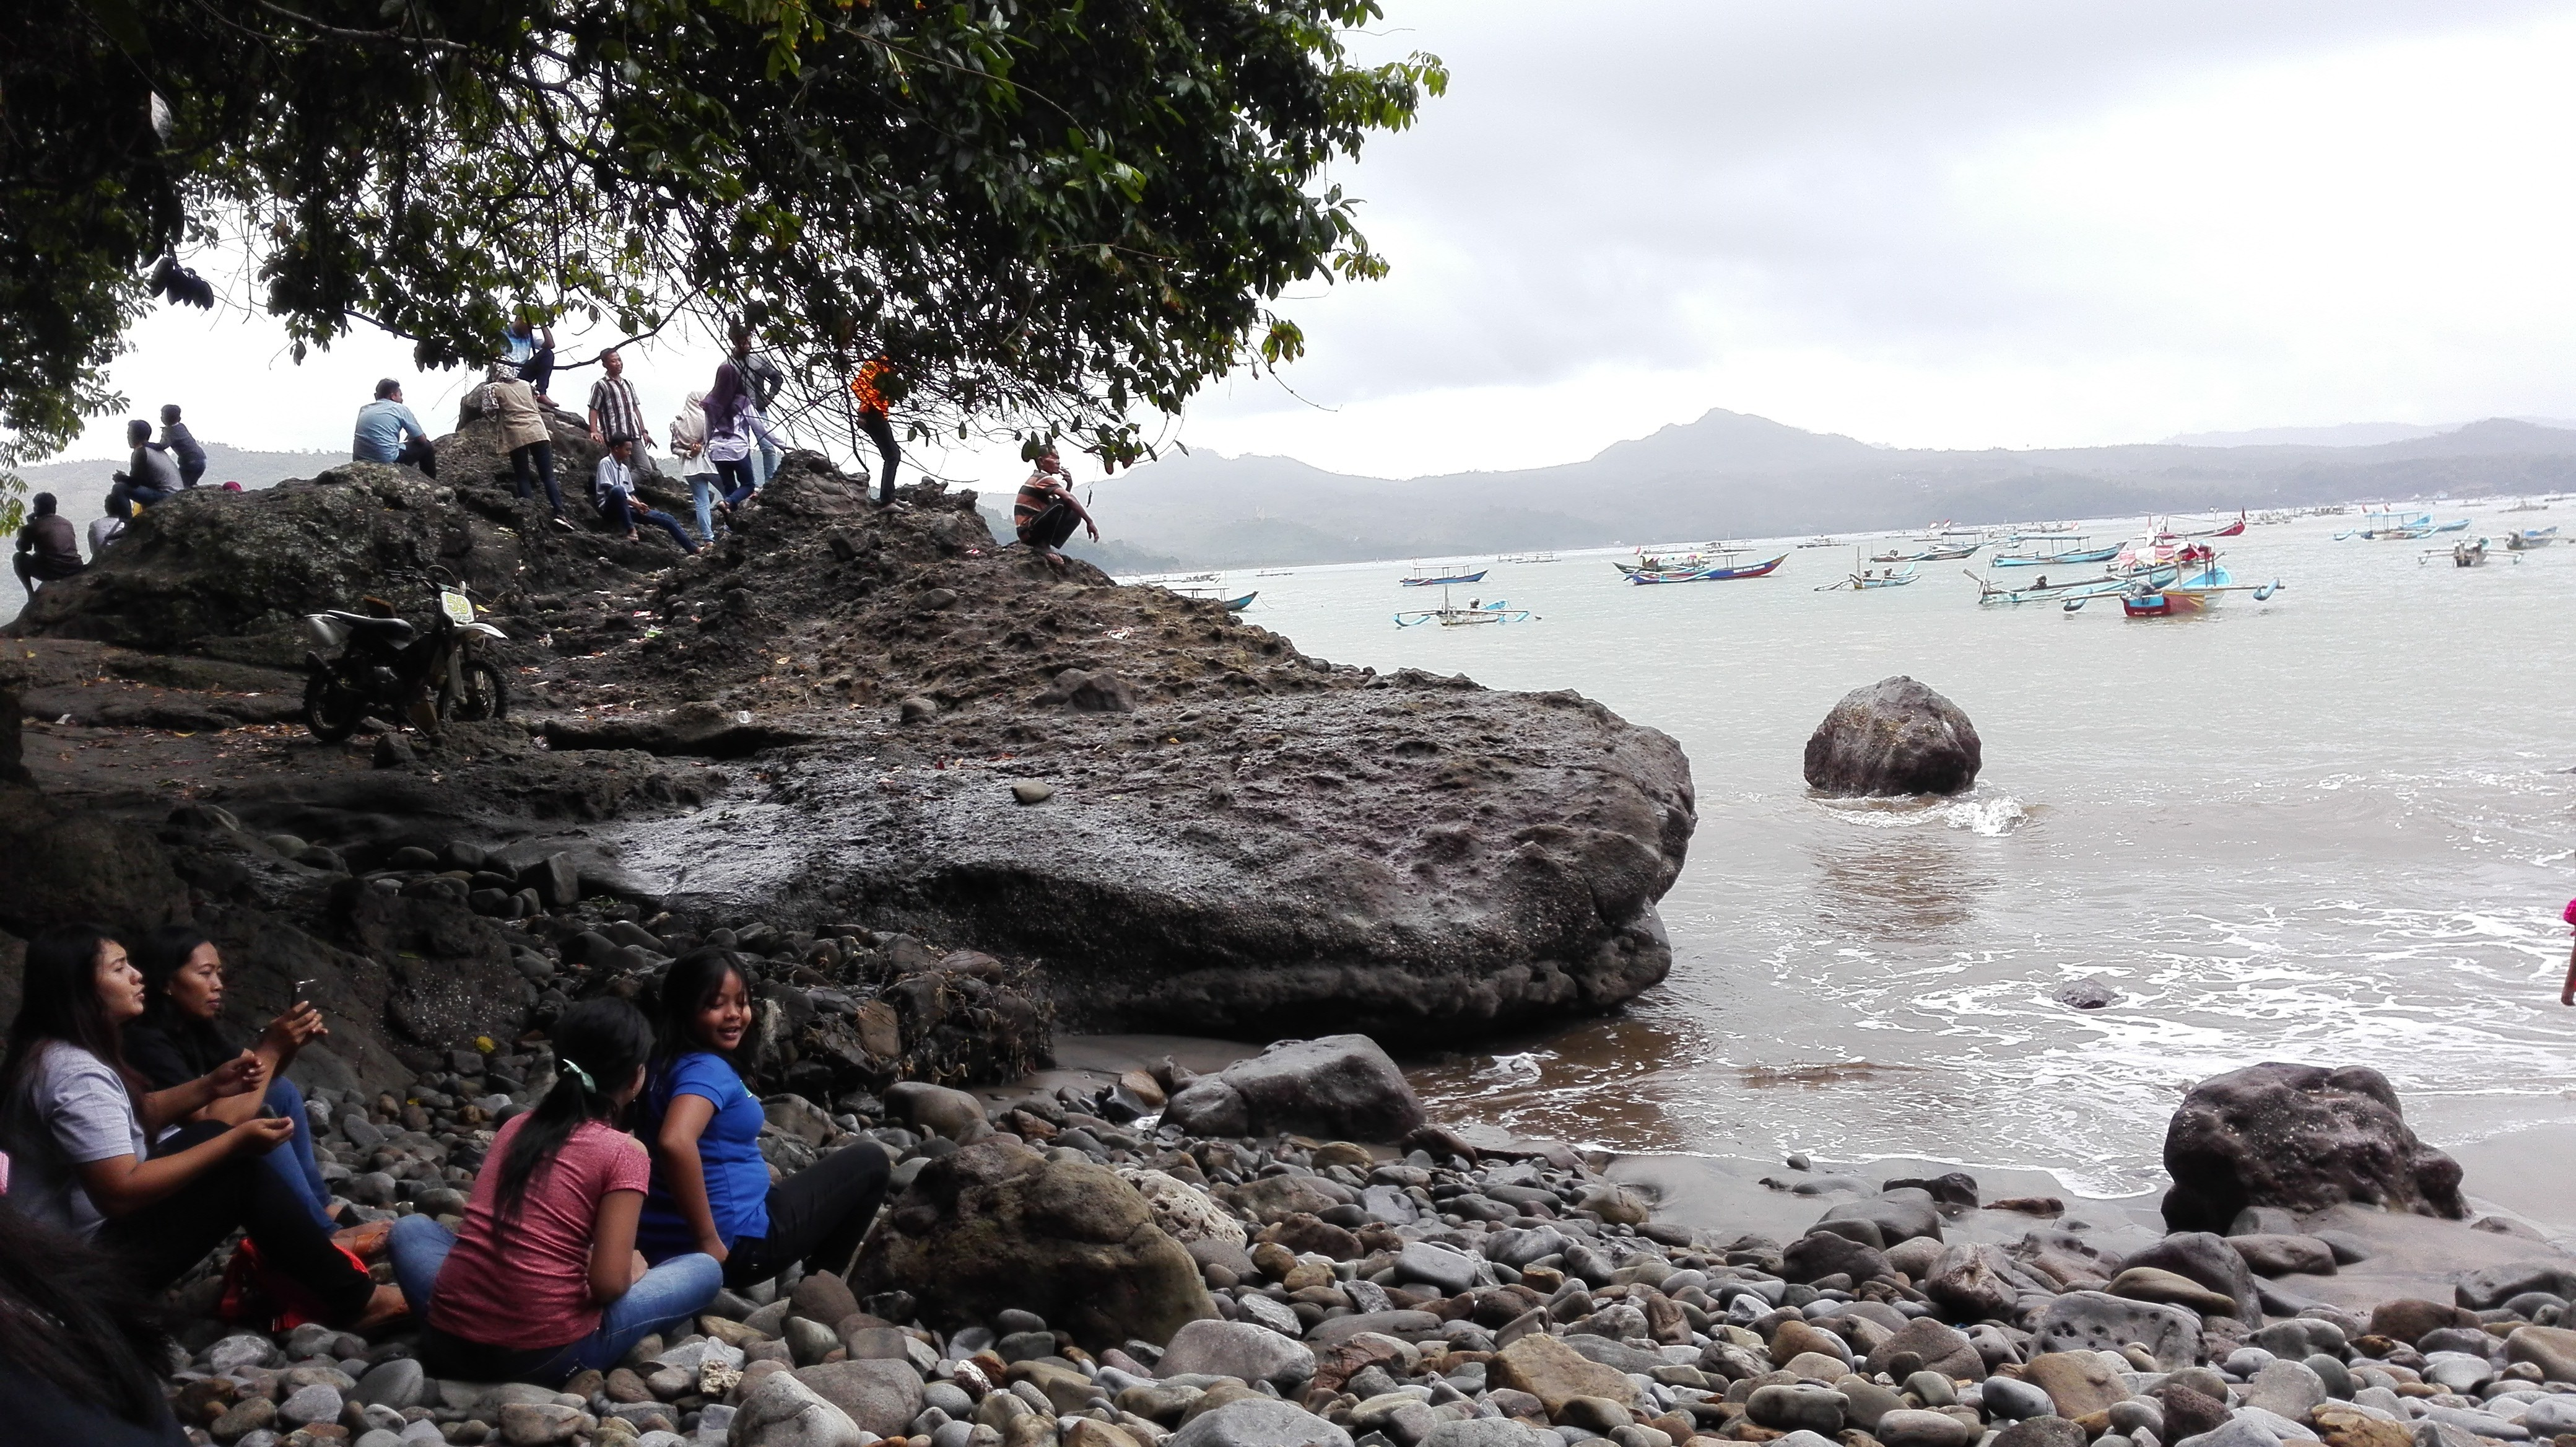 Taman Surga Ngrowo Tulungagung Kawan Berita Wisata Pantai Klatak Kab